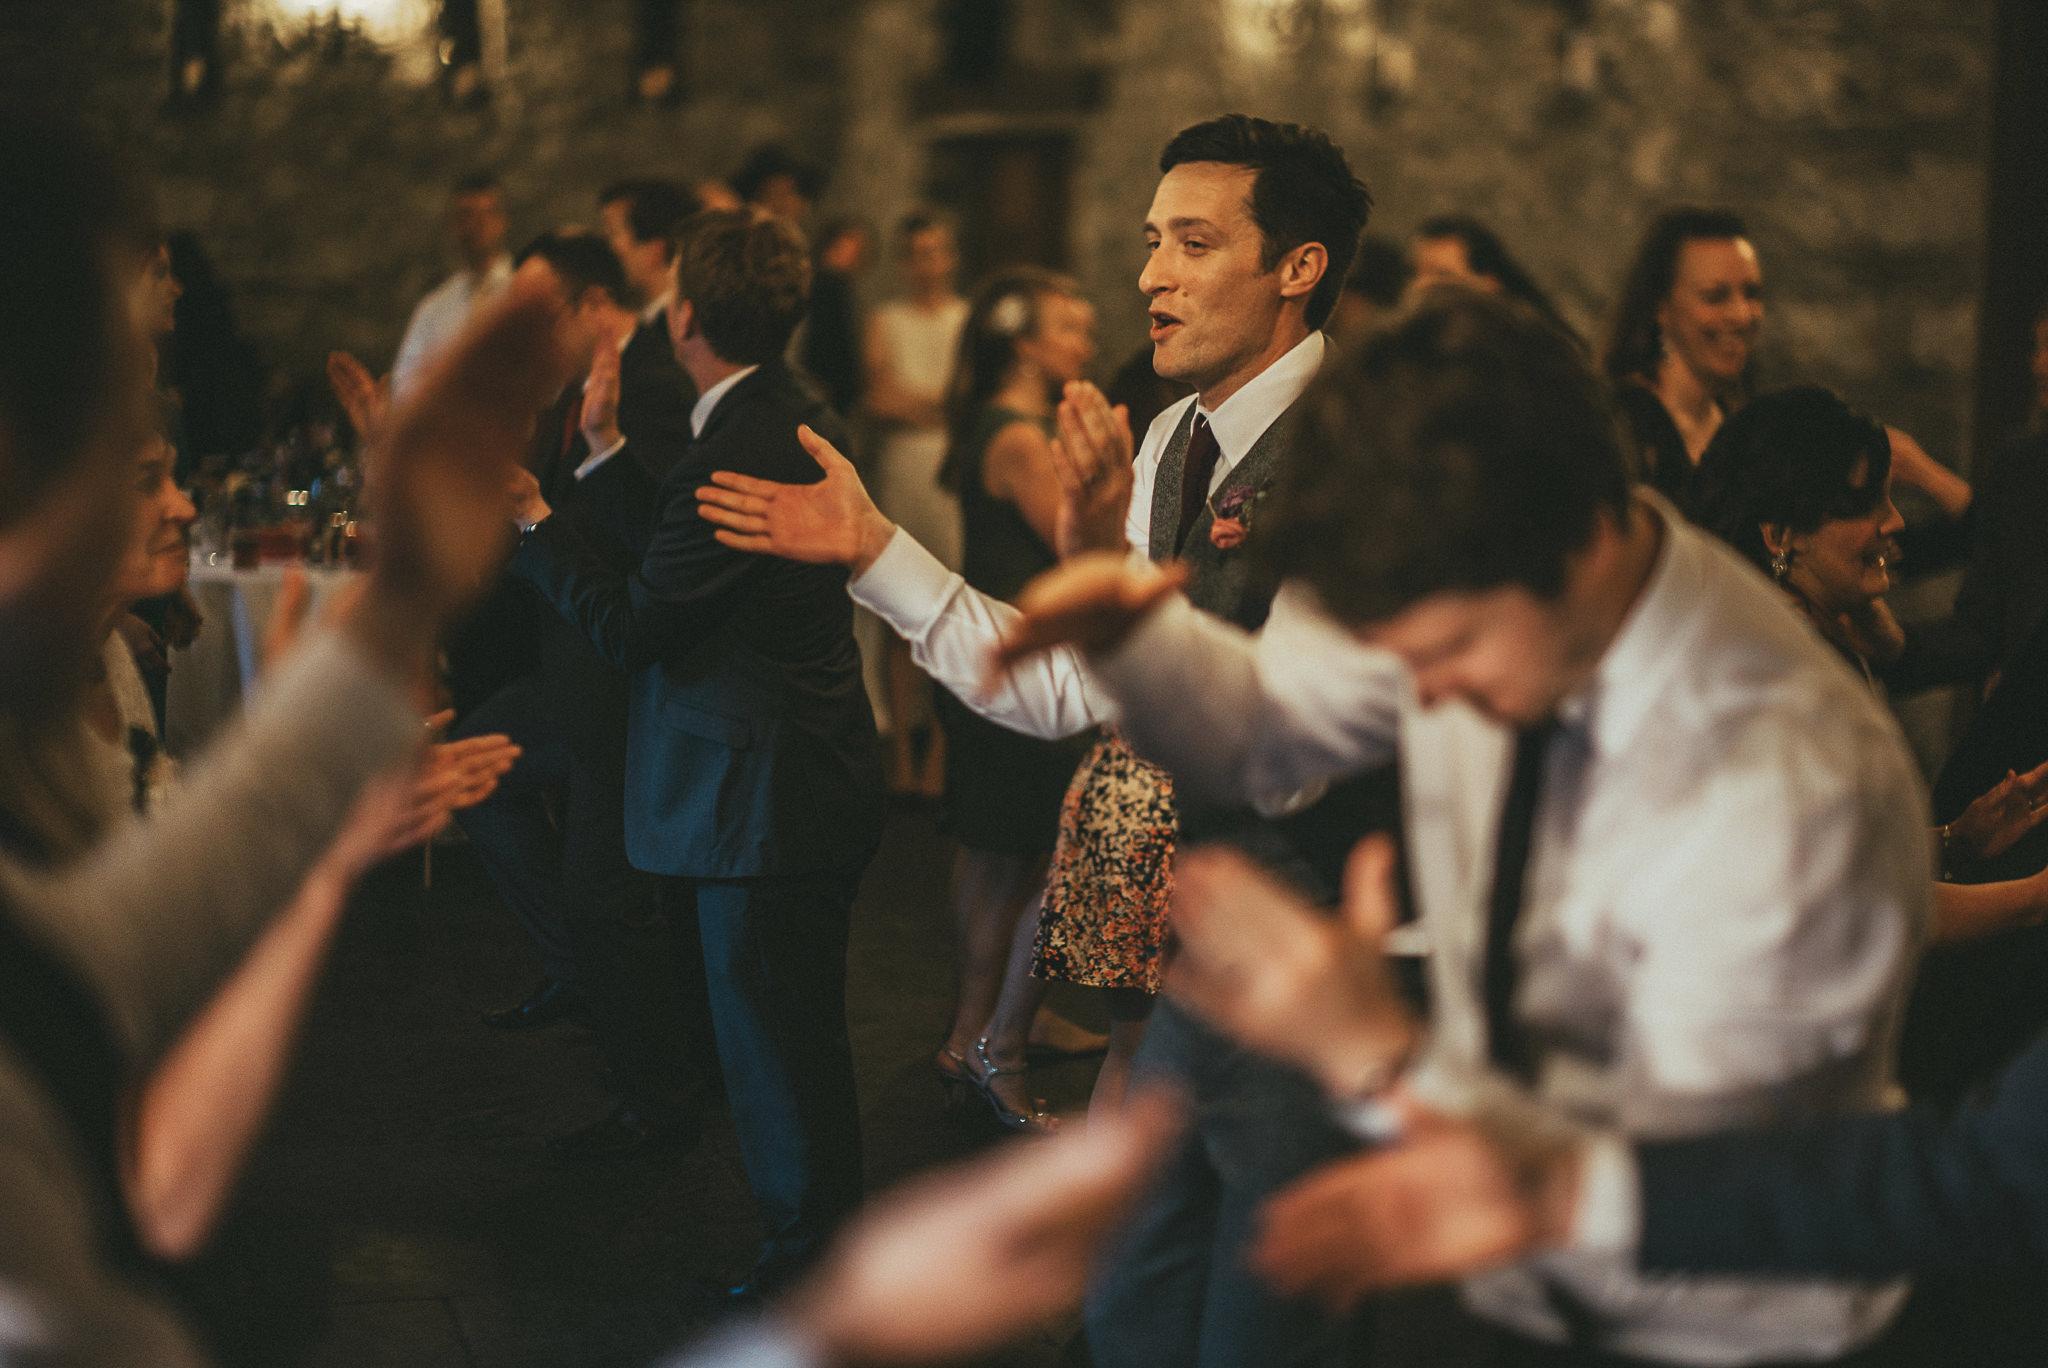 plas-isaf-corwen-north wales wedding-photography-photographer-91092